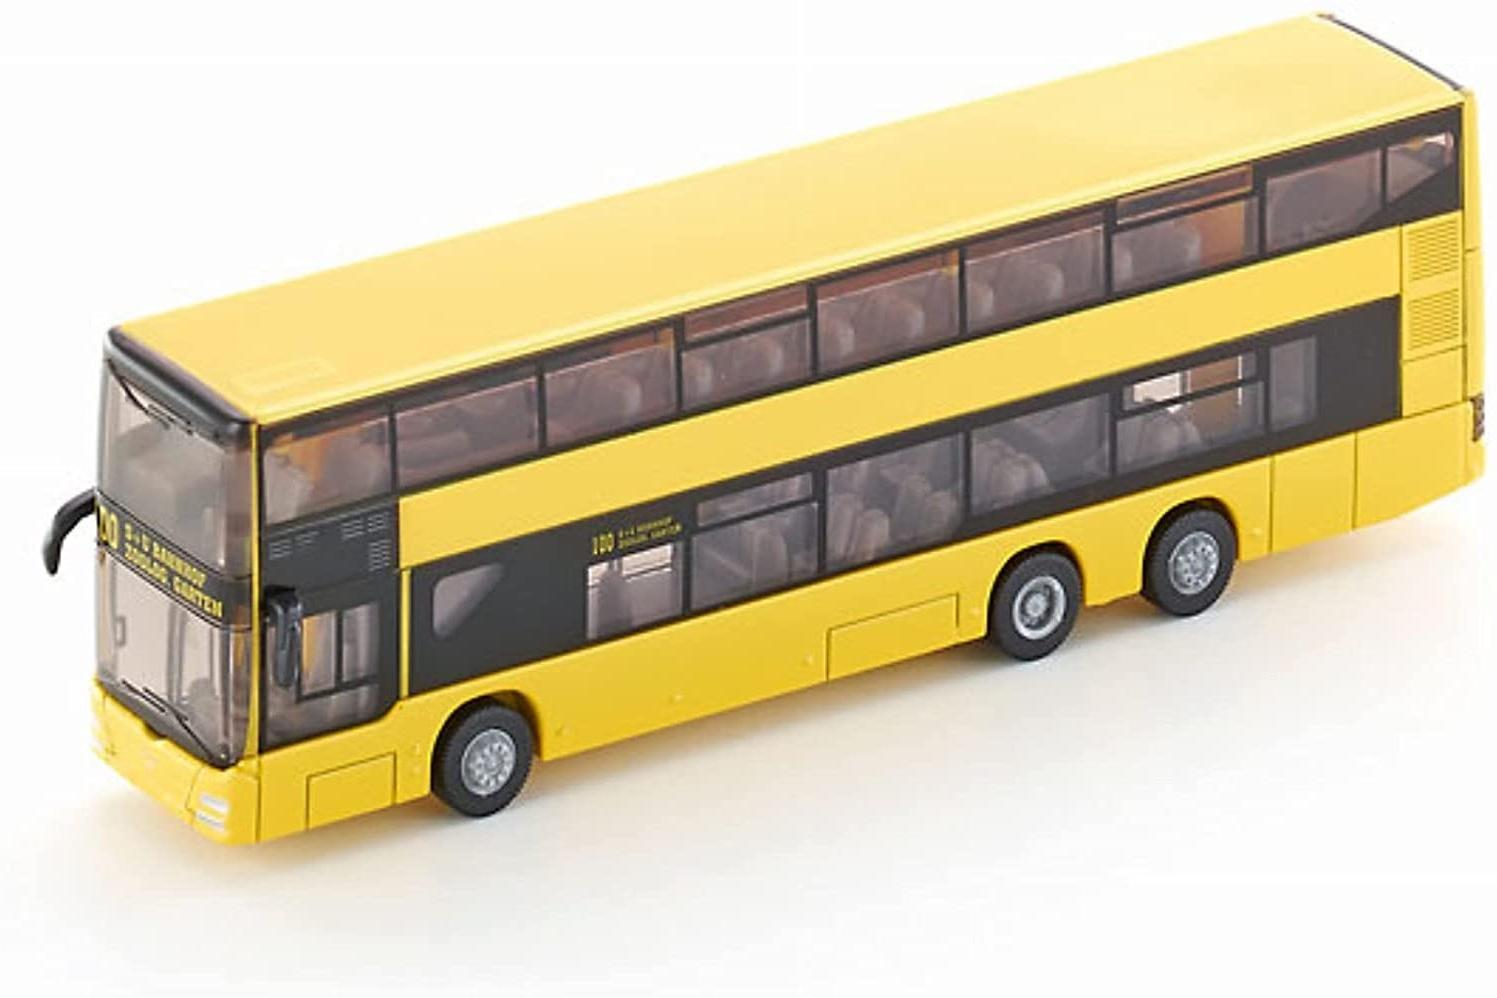 SIKU 1884, MAN Doppelstock Linienbus, 1:87, Metall/Kunststoff, Gelb, Bereifung aus Gummi Bild 1